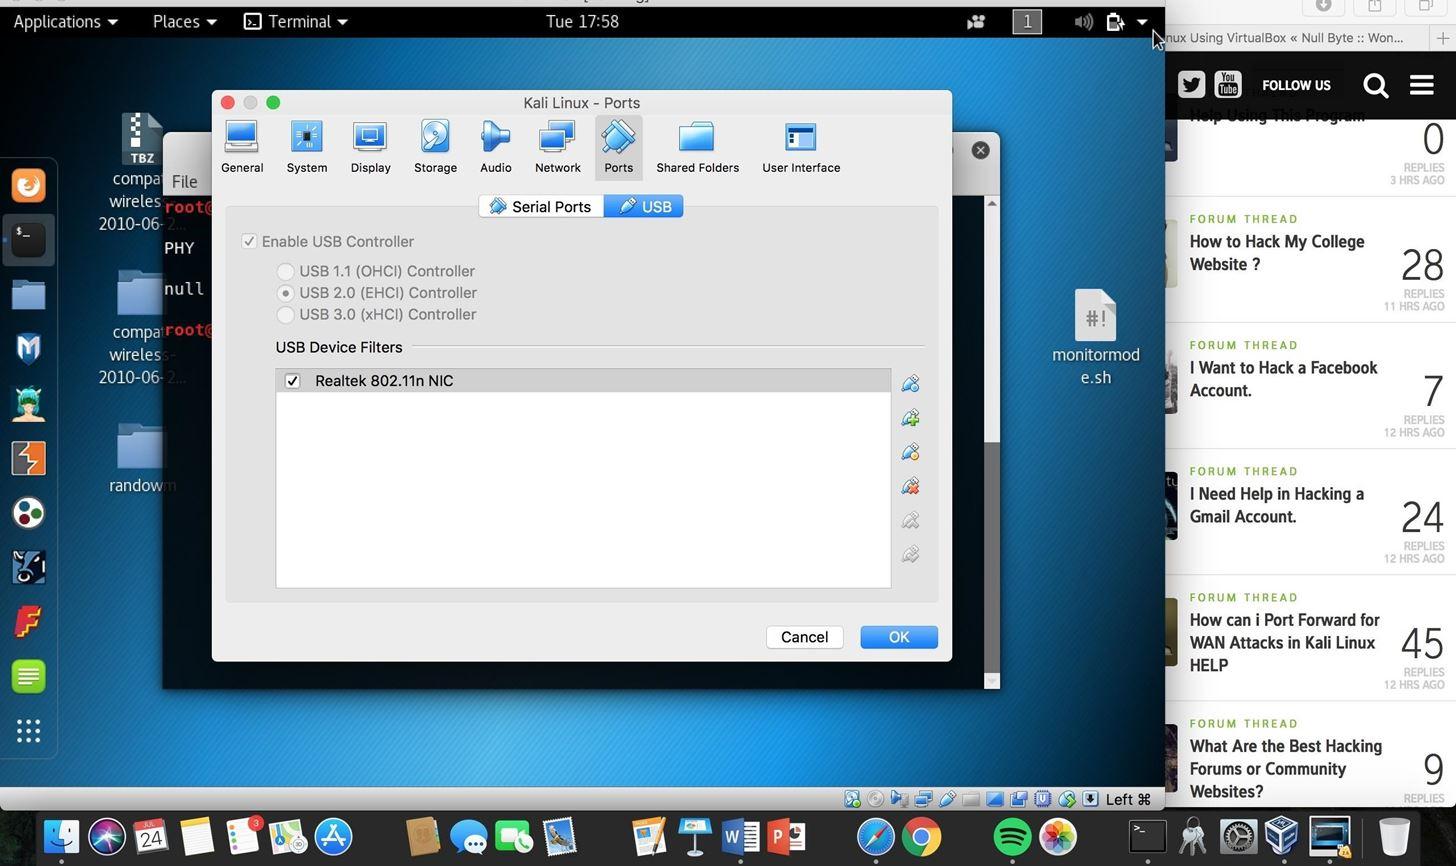 Kali Linux in Virtual Box Help « Null Byte :: WonderHowTo